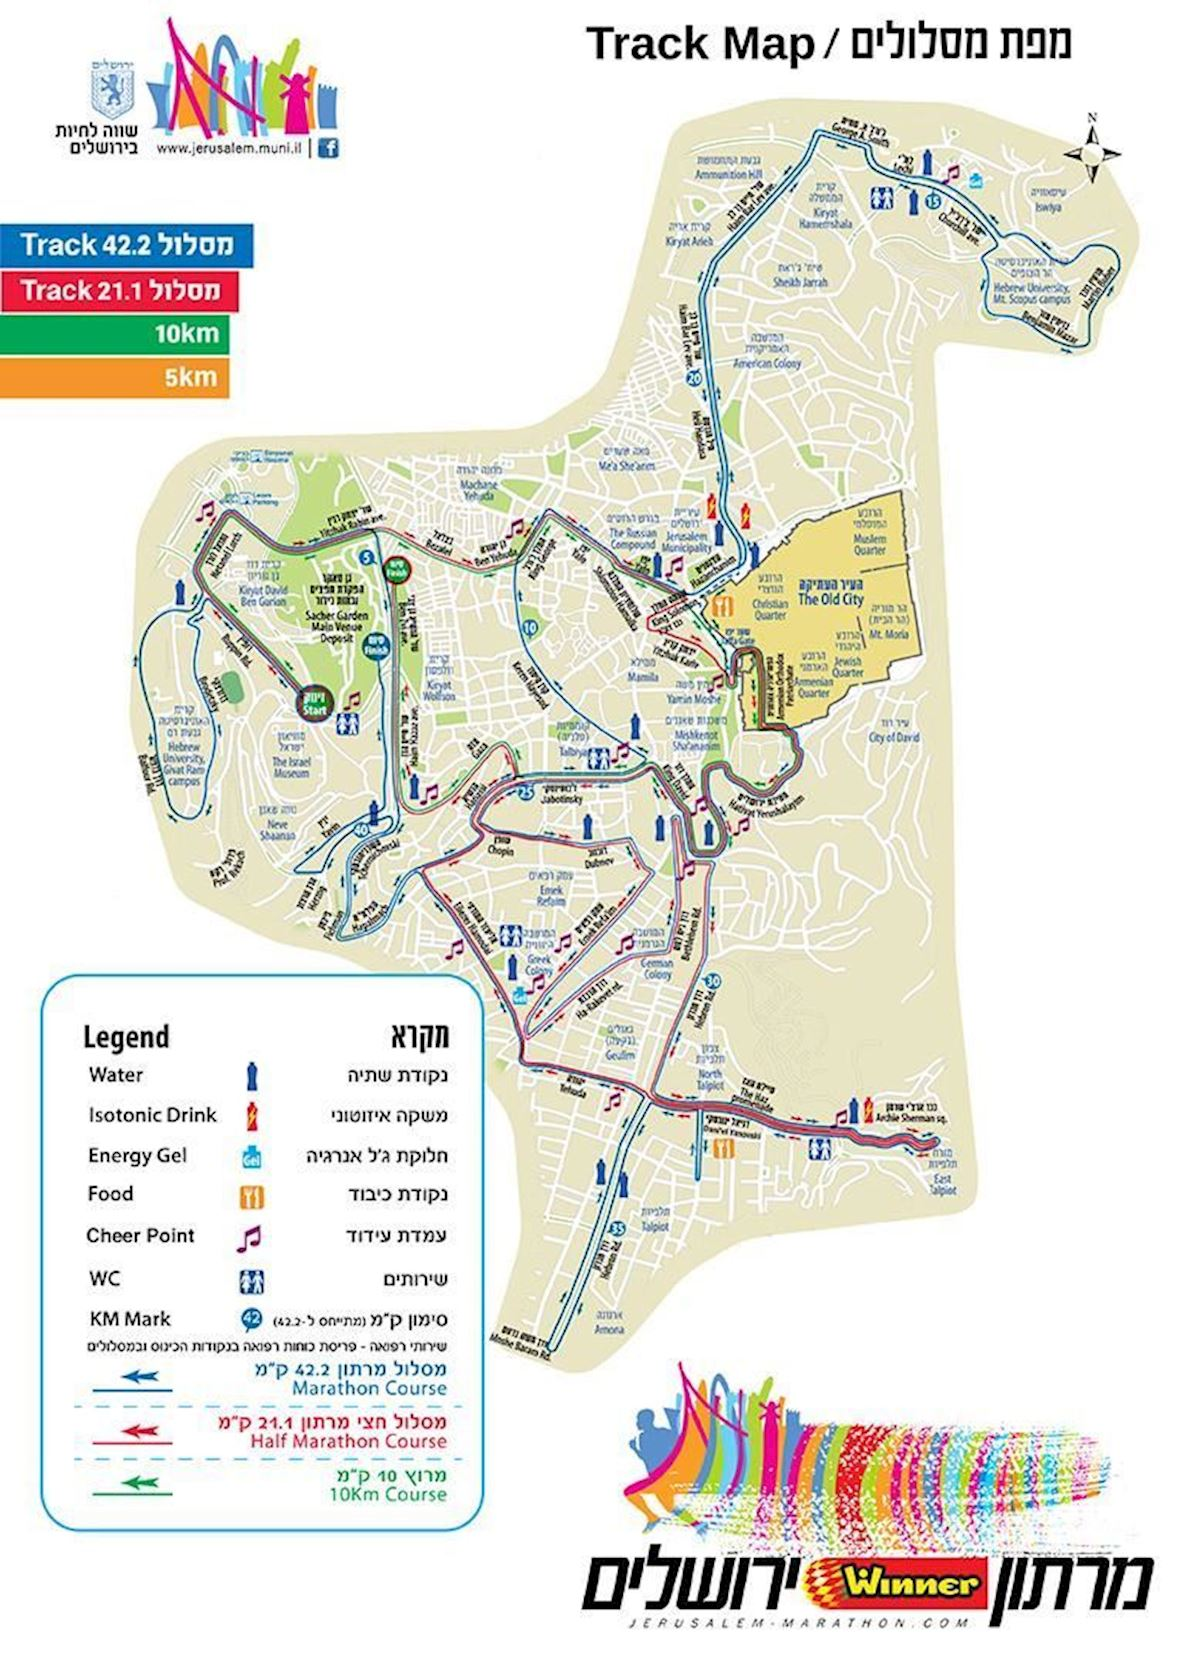 Jerusalem Marathon Mappa del percorso